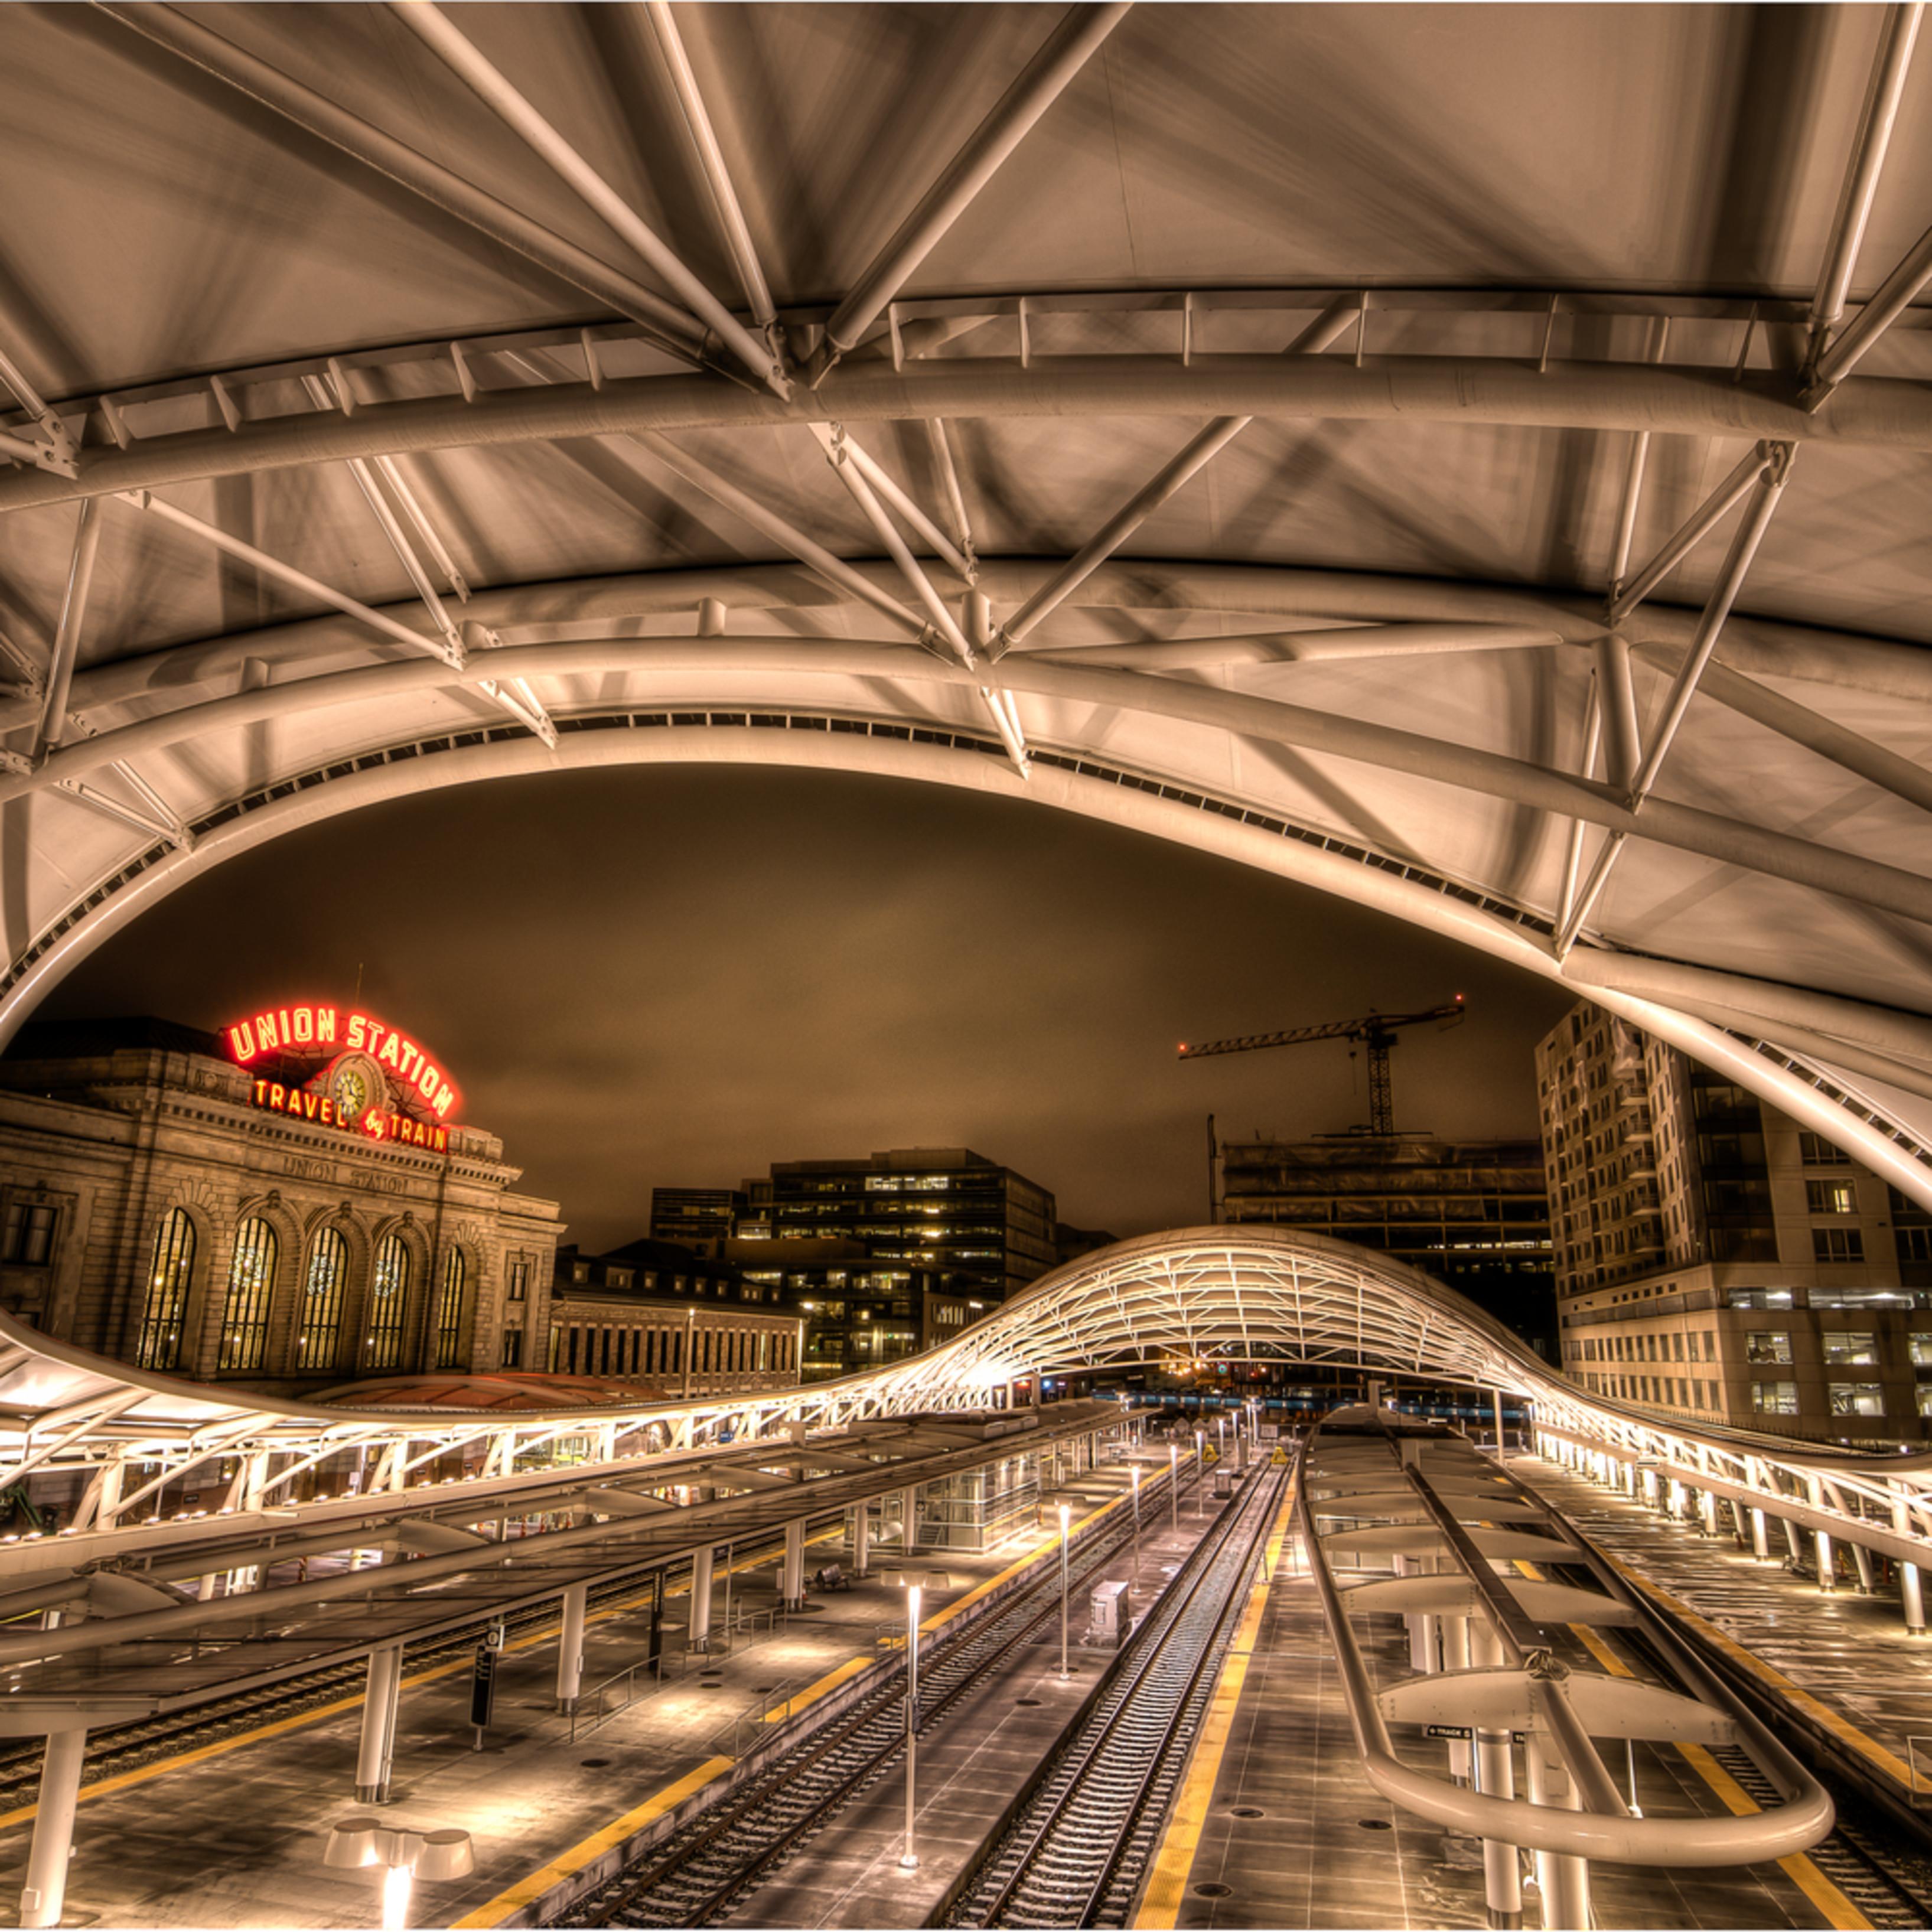 Travel by train asf u4l3ln